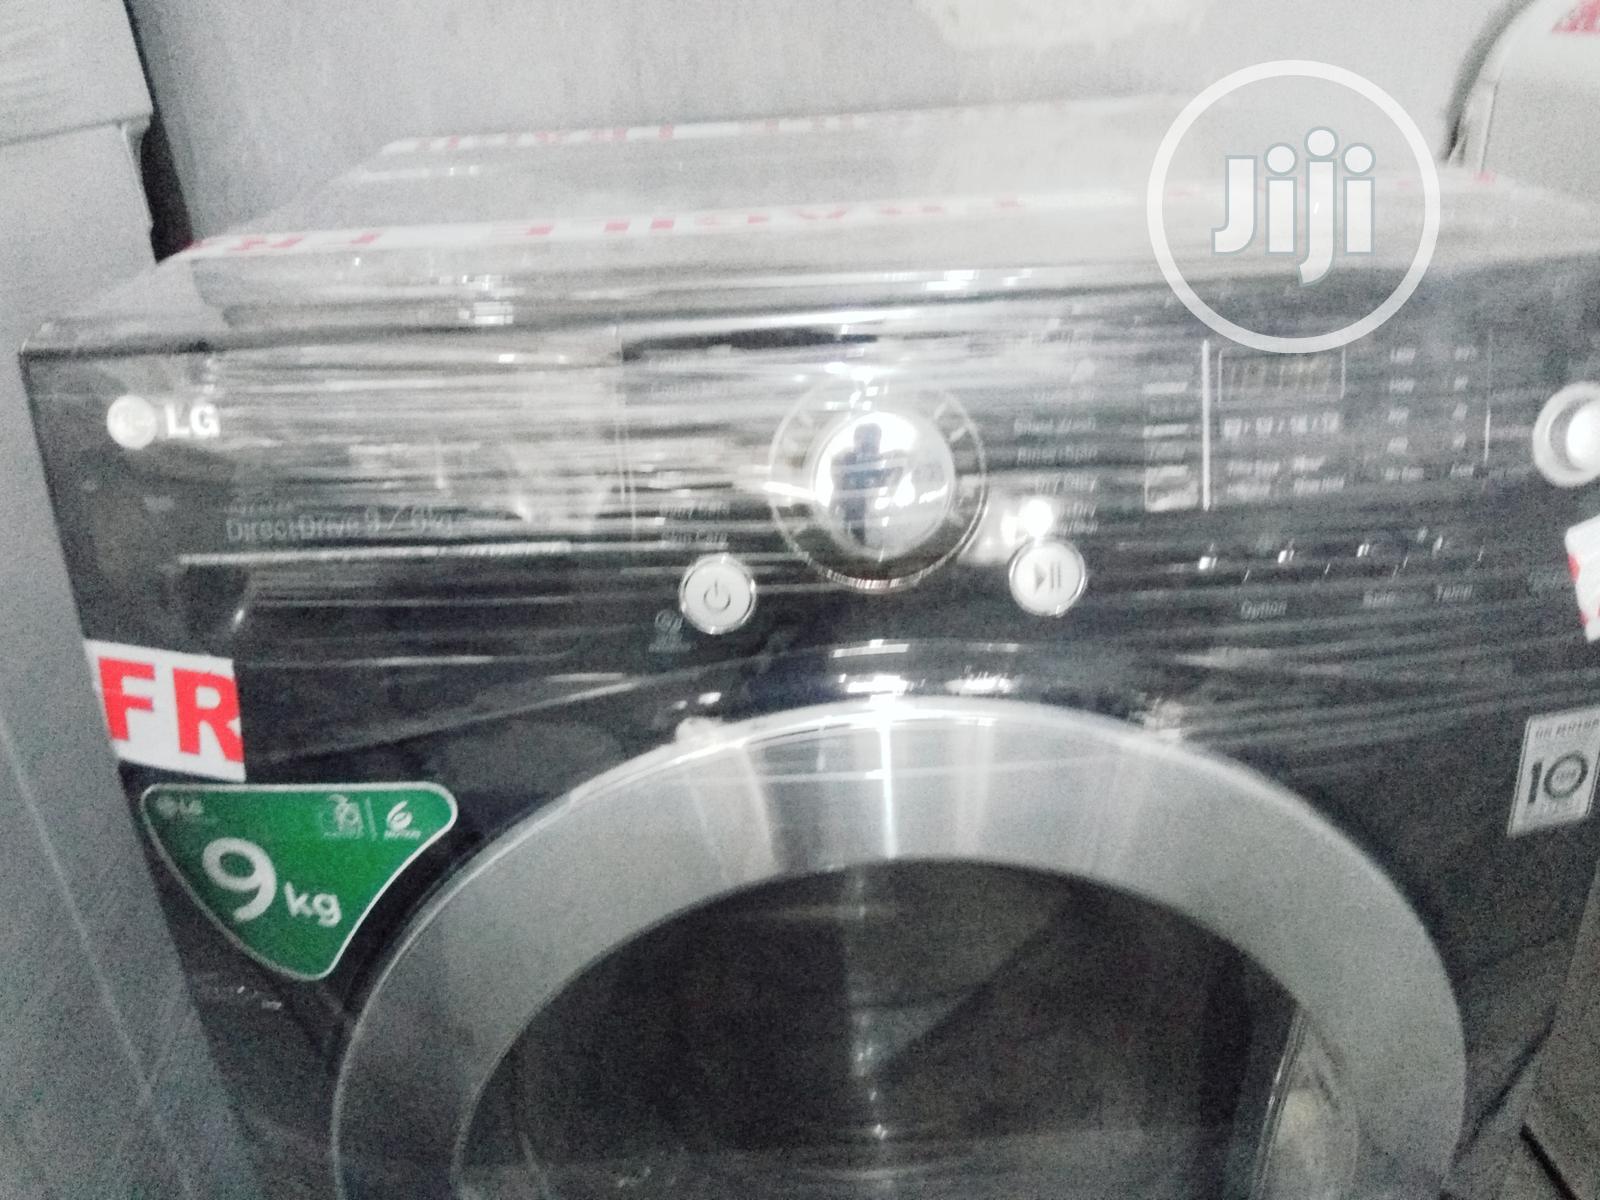 Inverter Drive LG 9kg Washing Machine Washer Dryer | Home Appliances for sale in Yaba, Lagos State, Nigeria